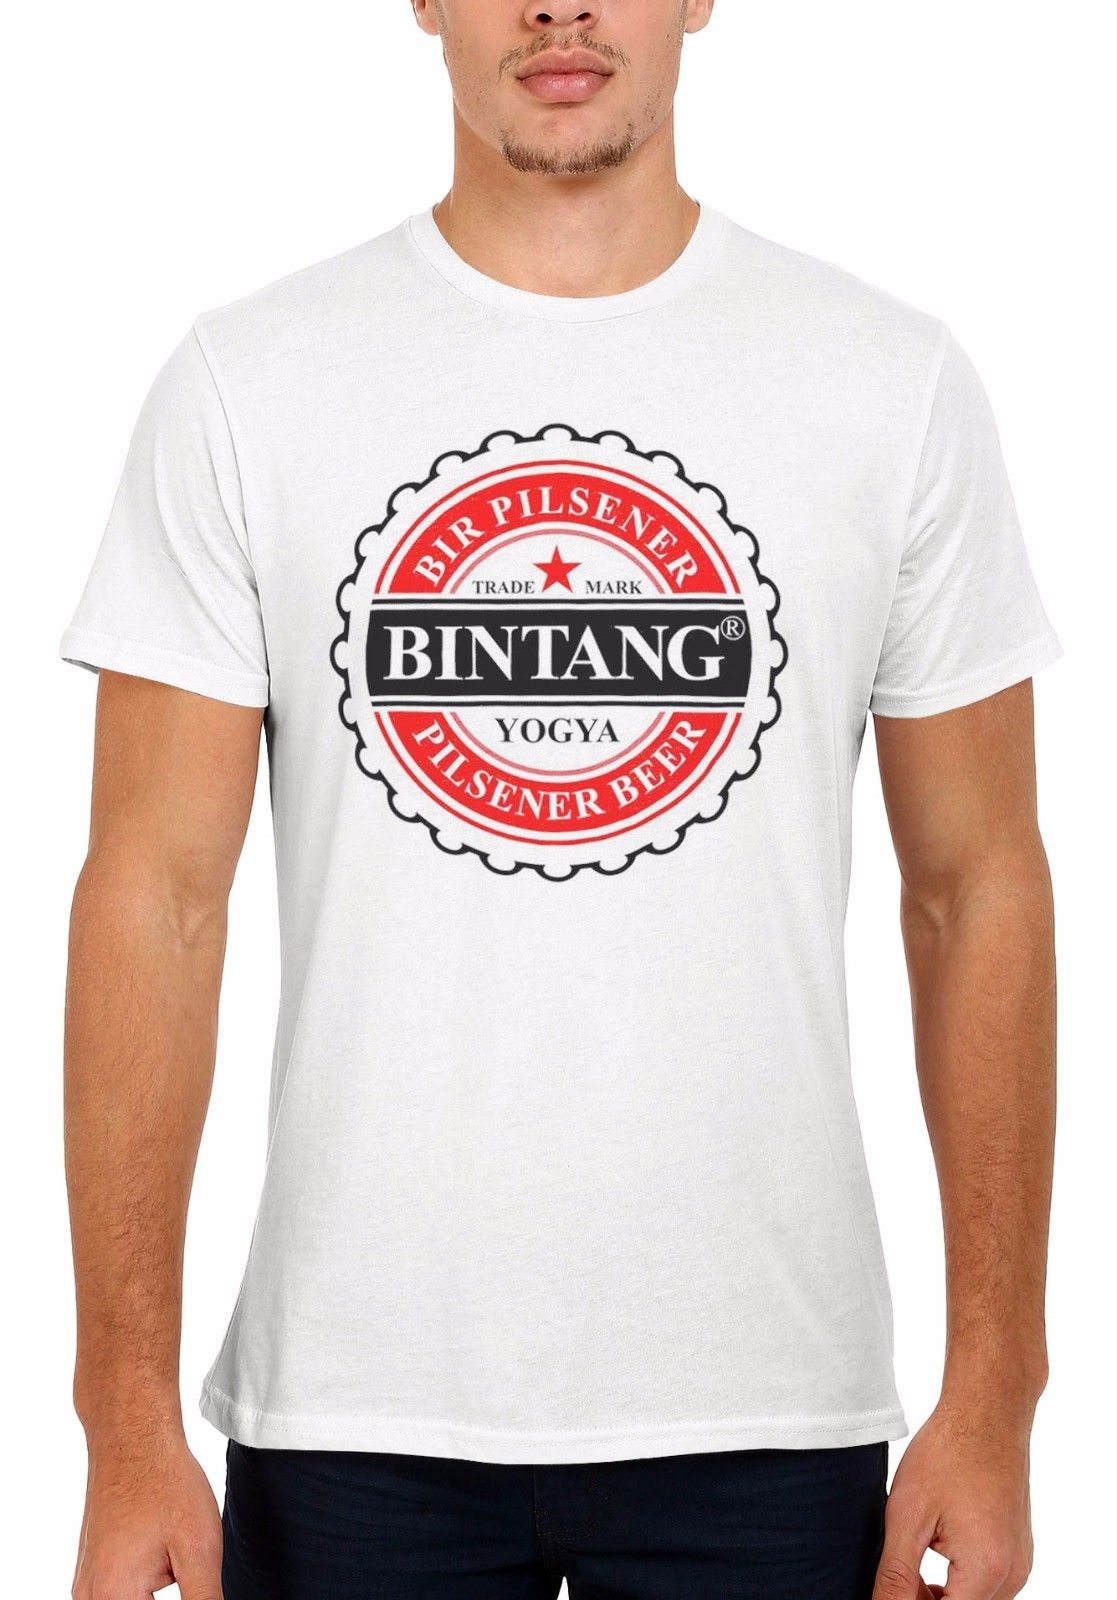 Bintang Bali cerveza Verano Divertido fresco hombres mujeres chaleco Top Unisex camiseta 1905 suelta Negro hombres camisetas Homme